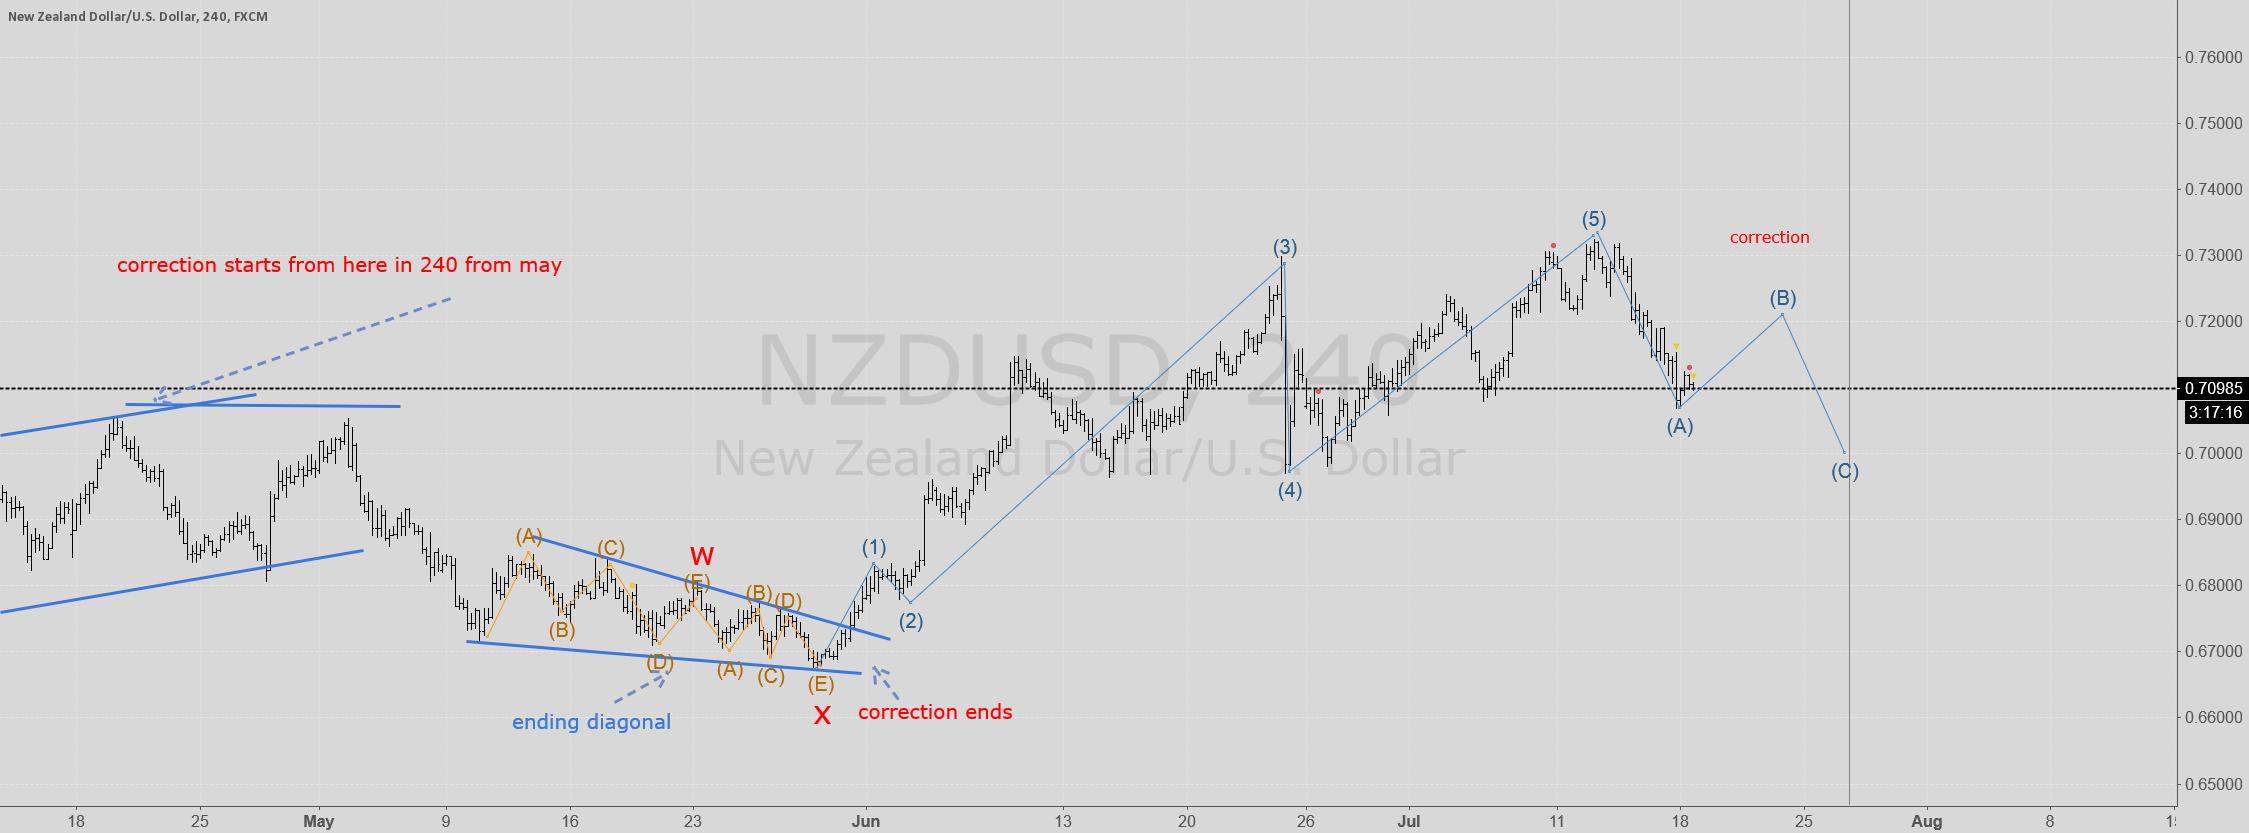 NZDUSD is in correction again